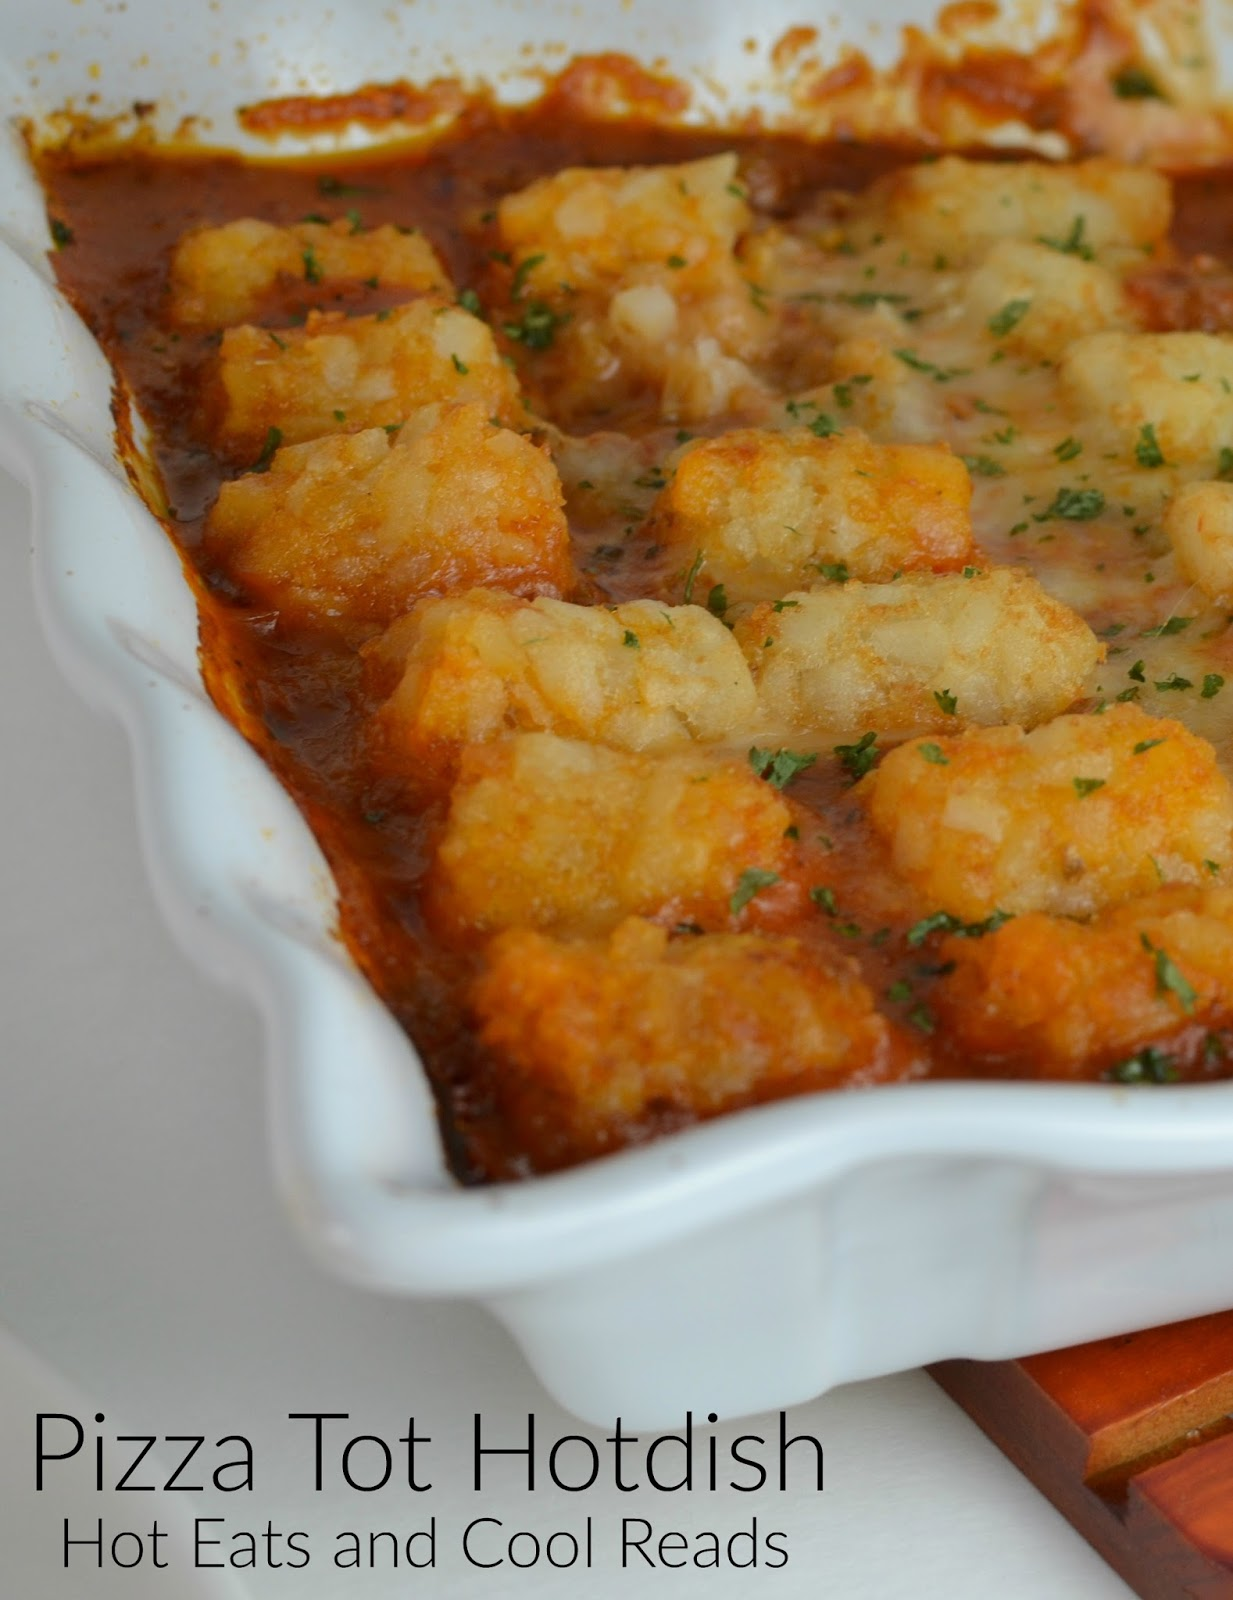 Hot Eats and Cool Reads: Pizza Tater Tot Hotdish Recipe